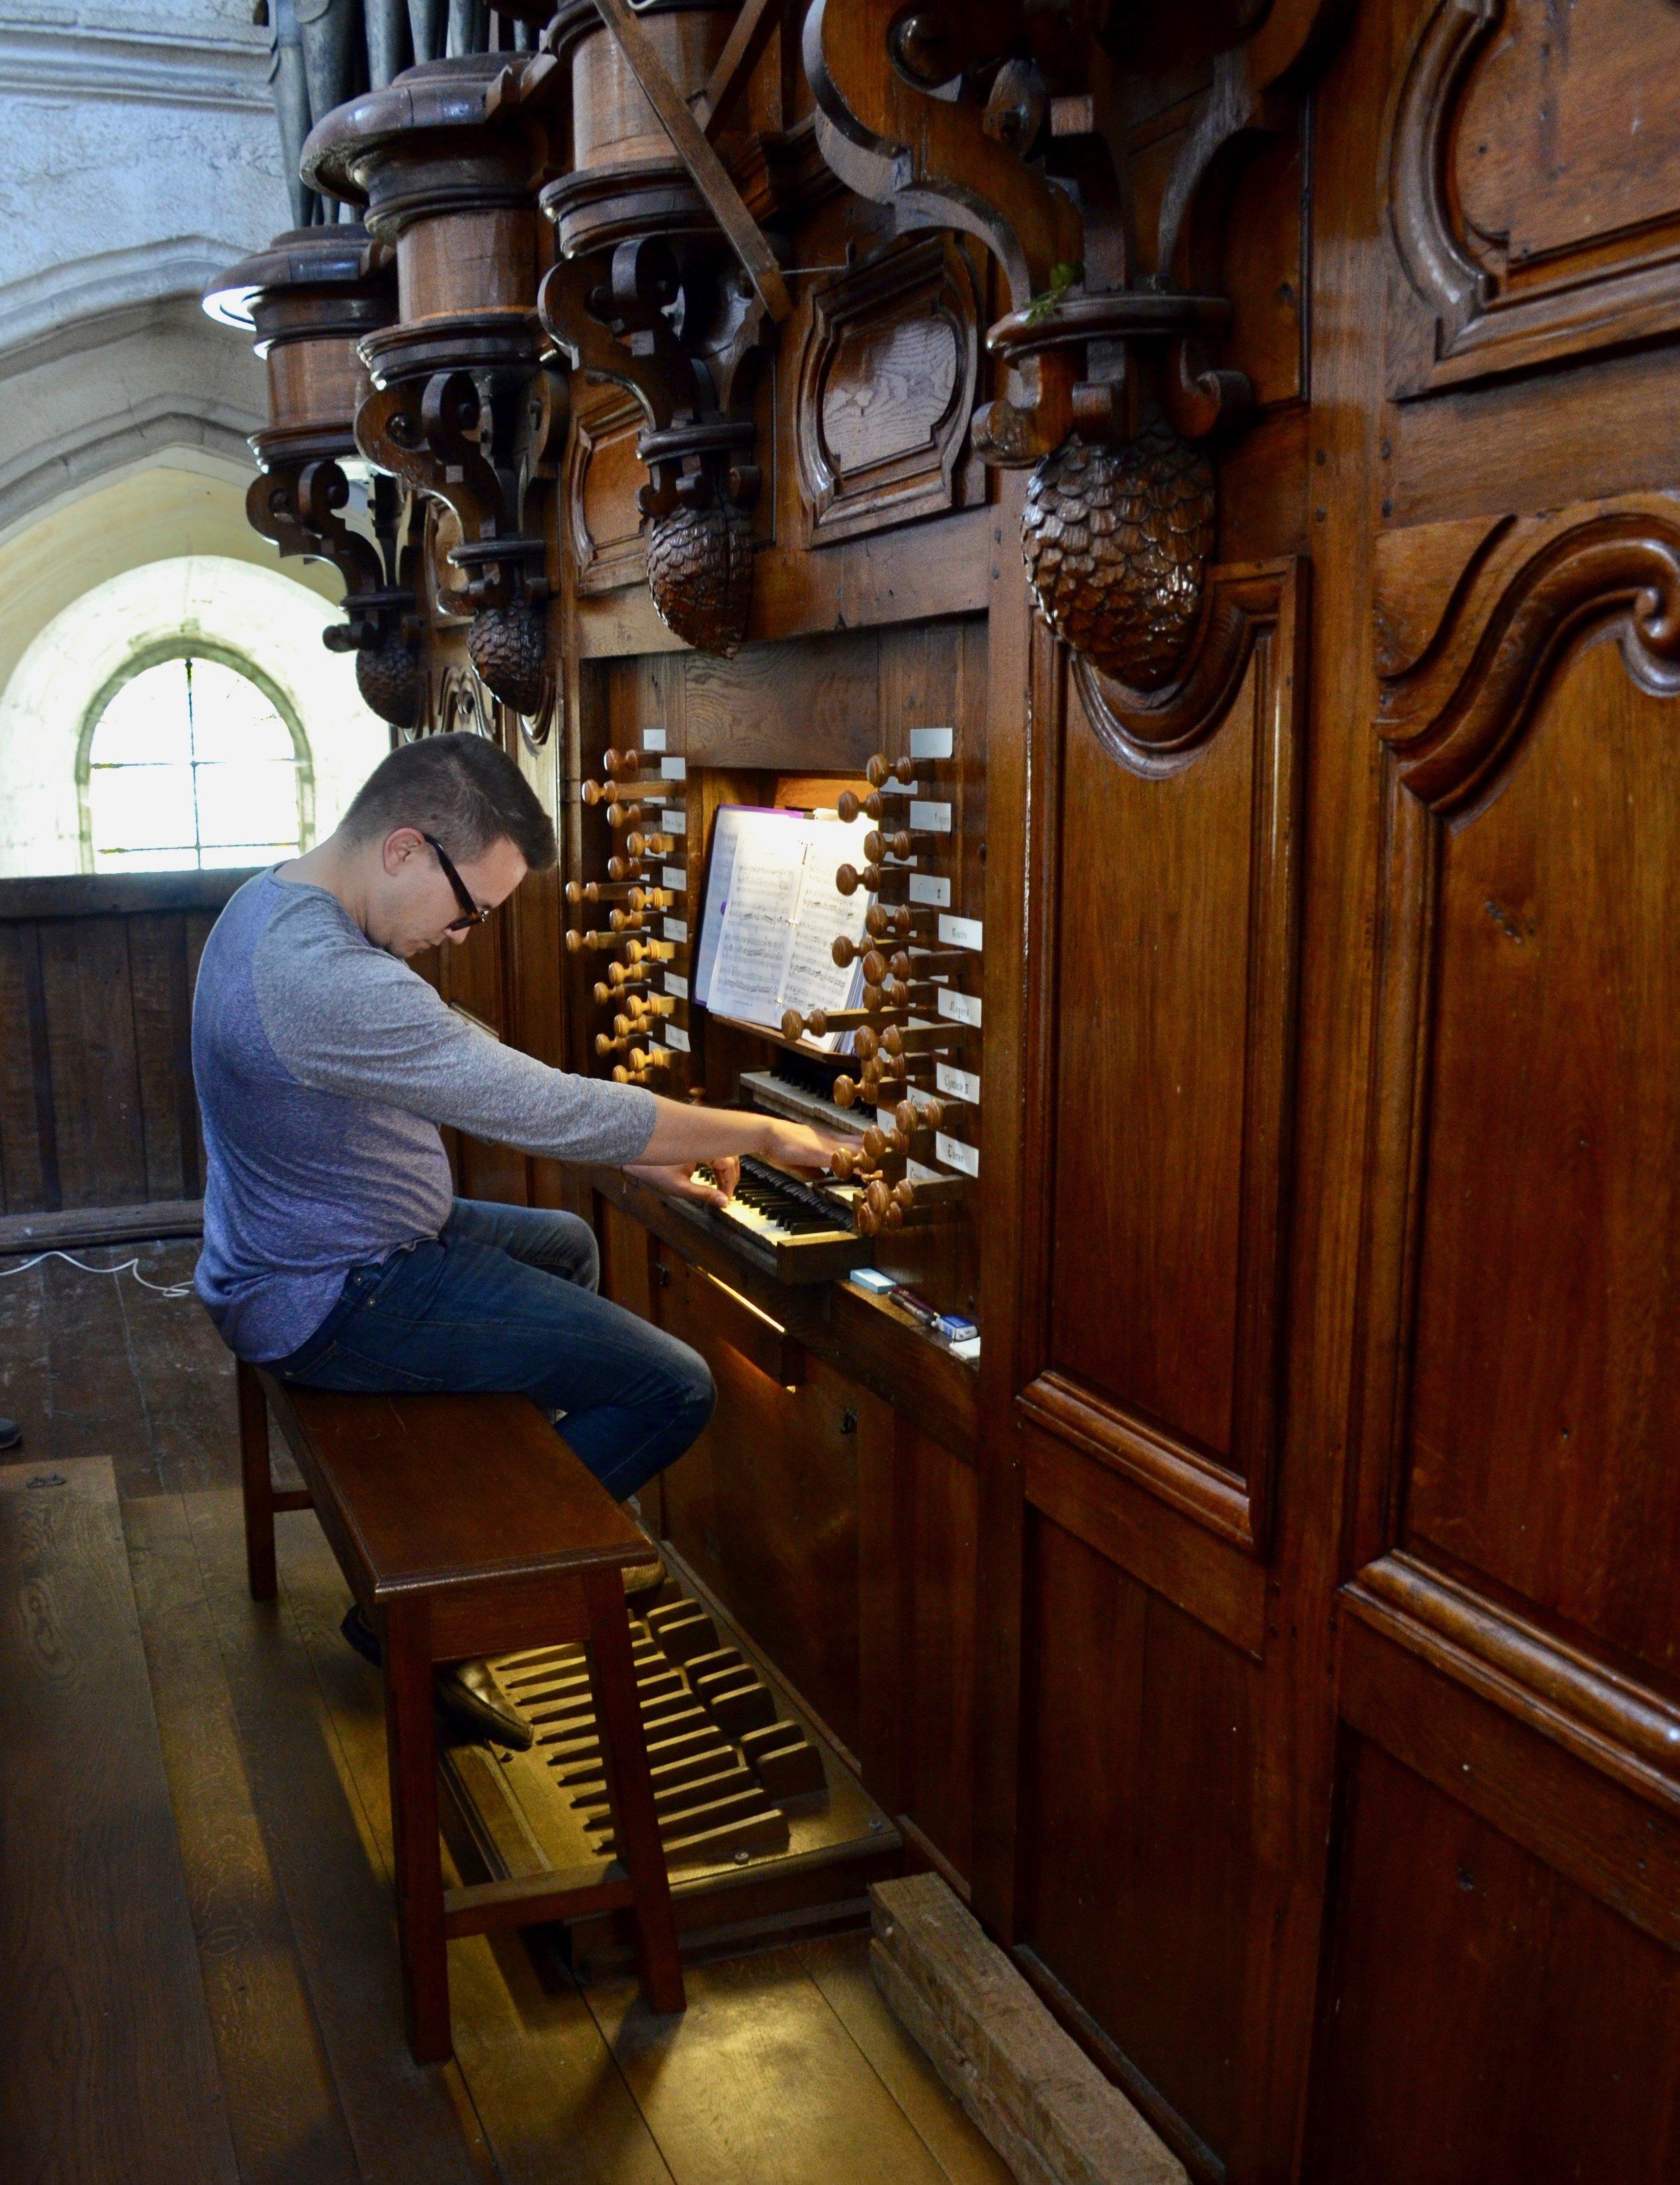 Corey de Tar plays the organ at Rozay-en-Brie!